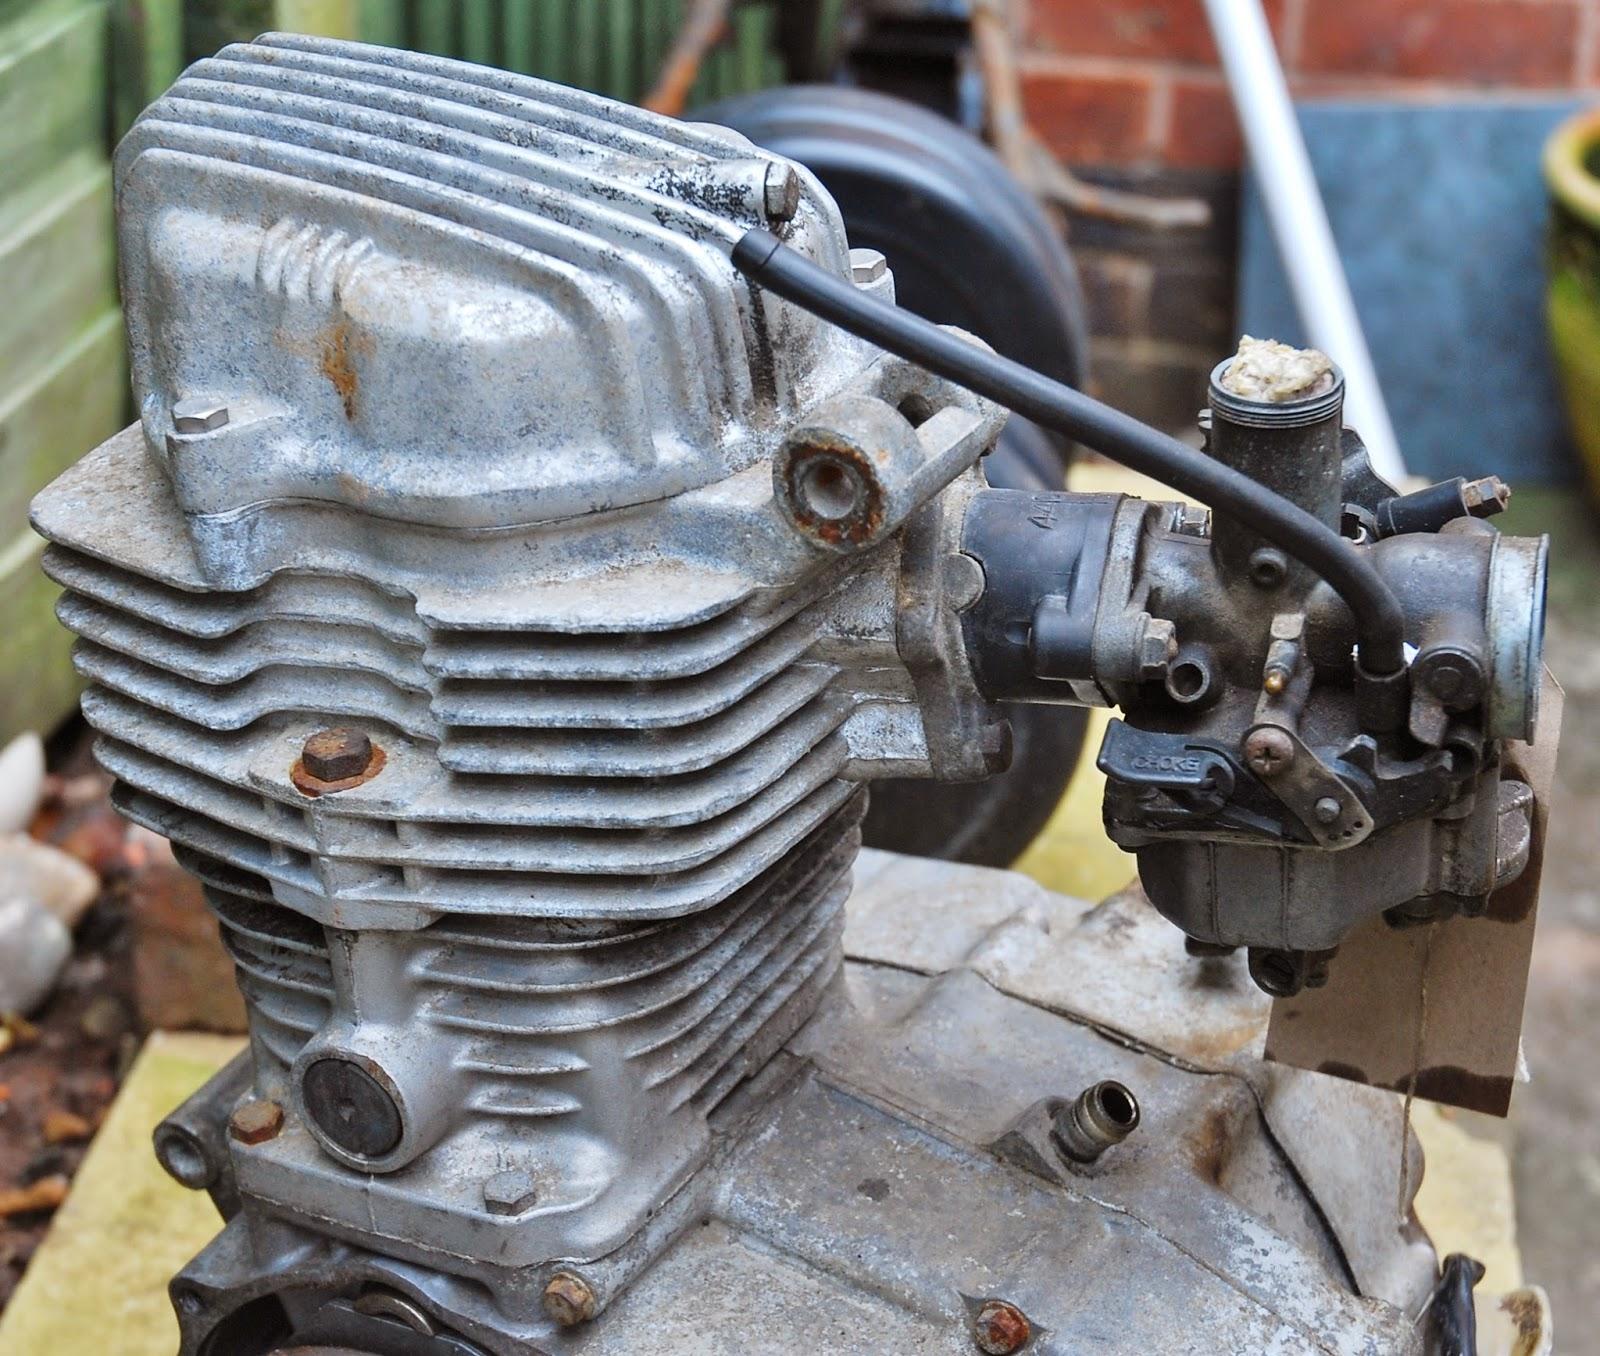 Honda Cg 125 Owner Blog Honda Cg 125 Engine Strip Down